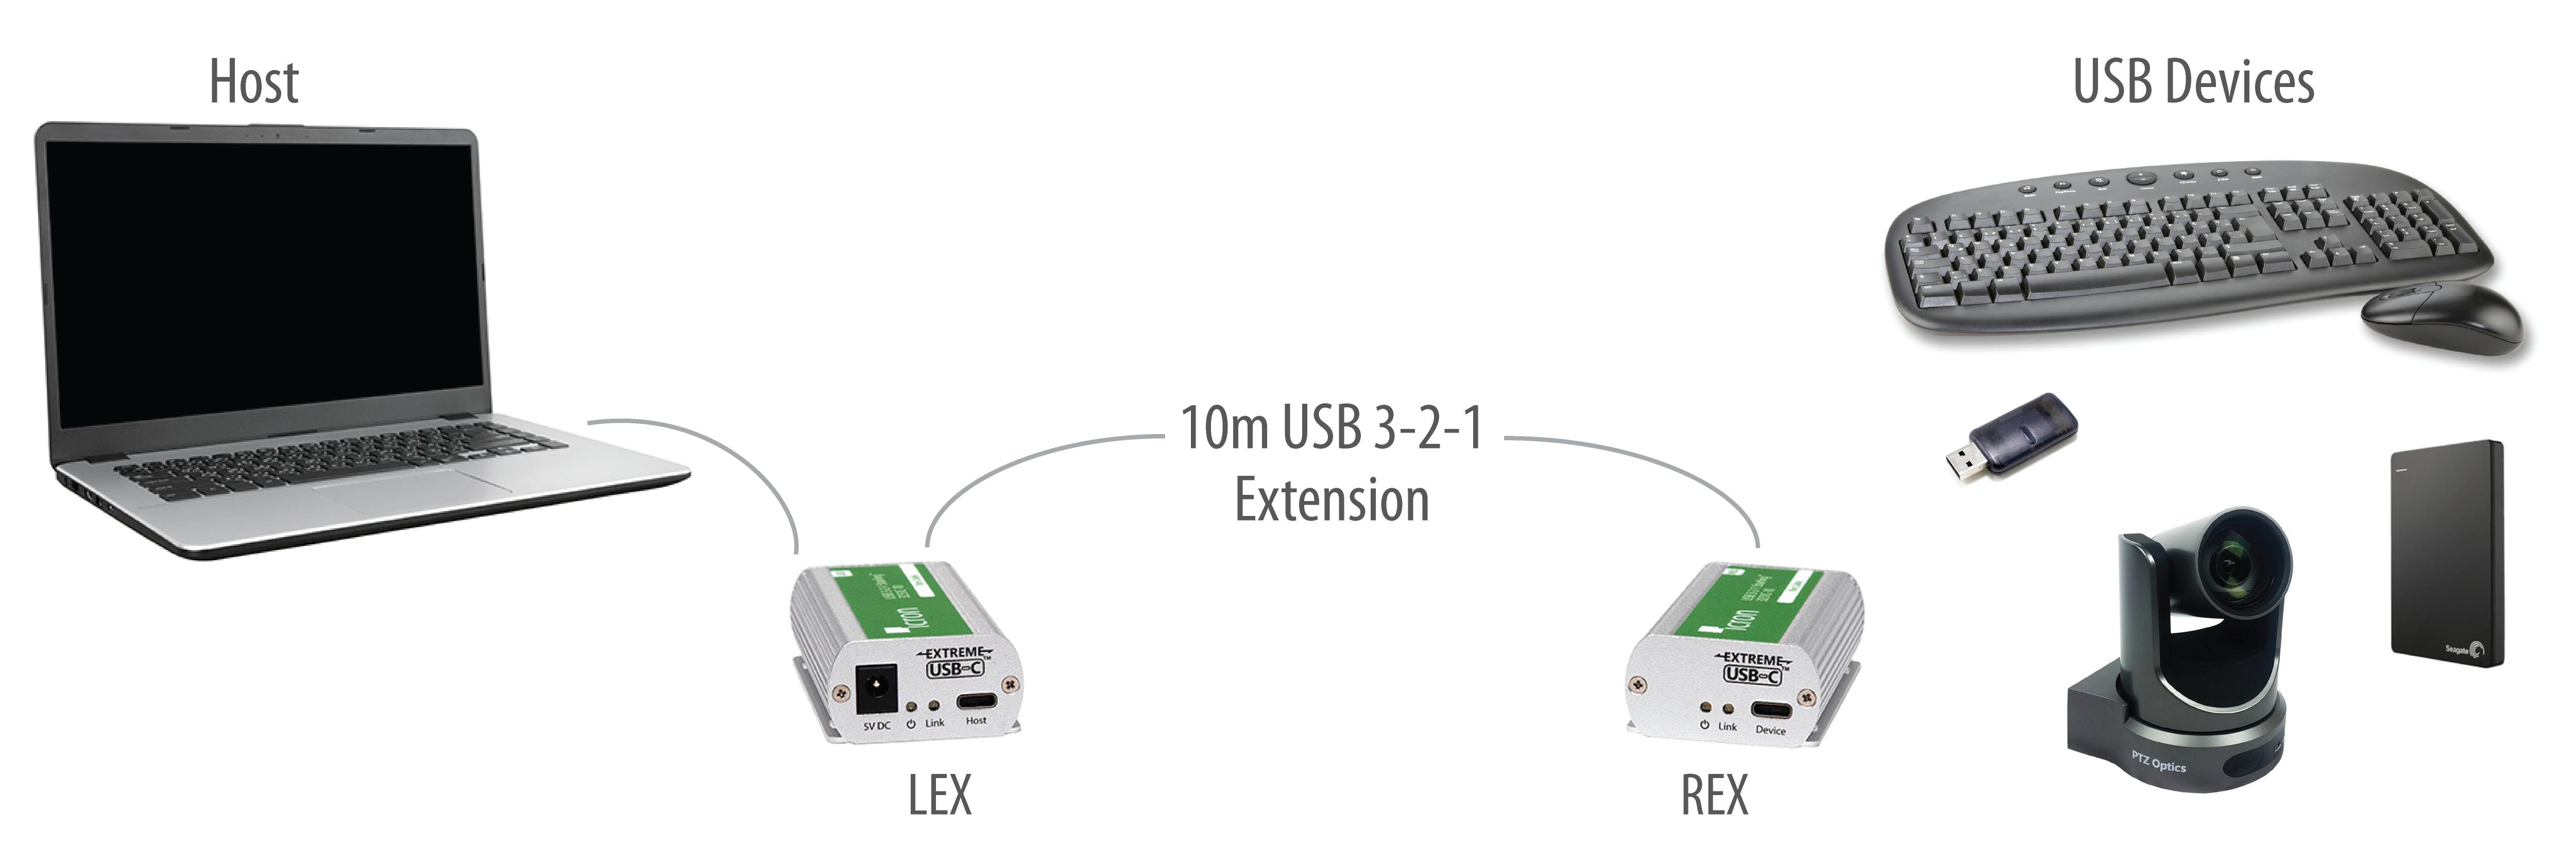 Icron Starling 3251C application diagram